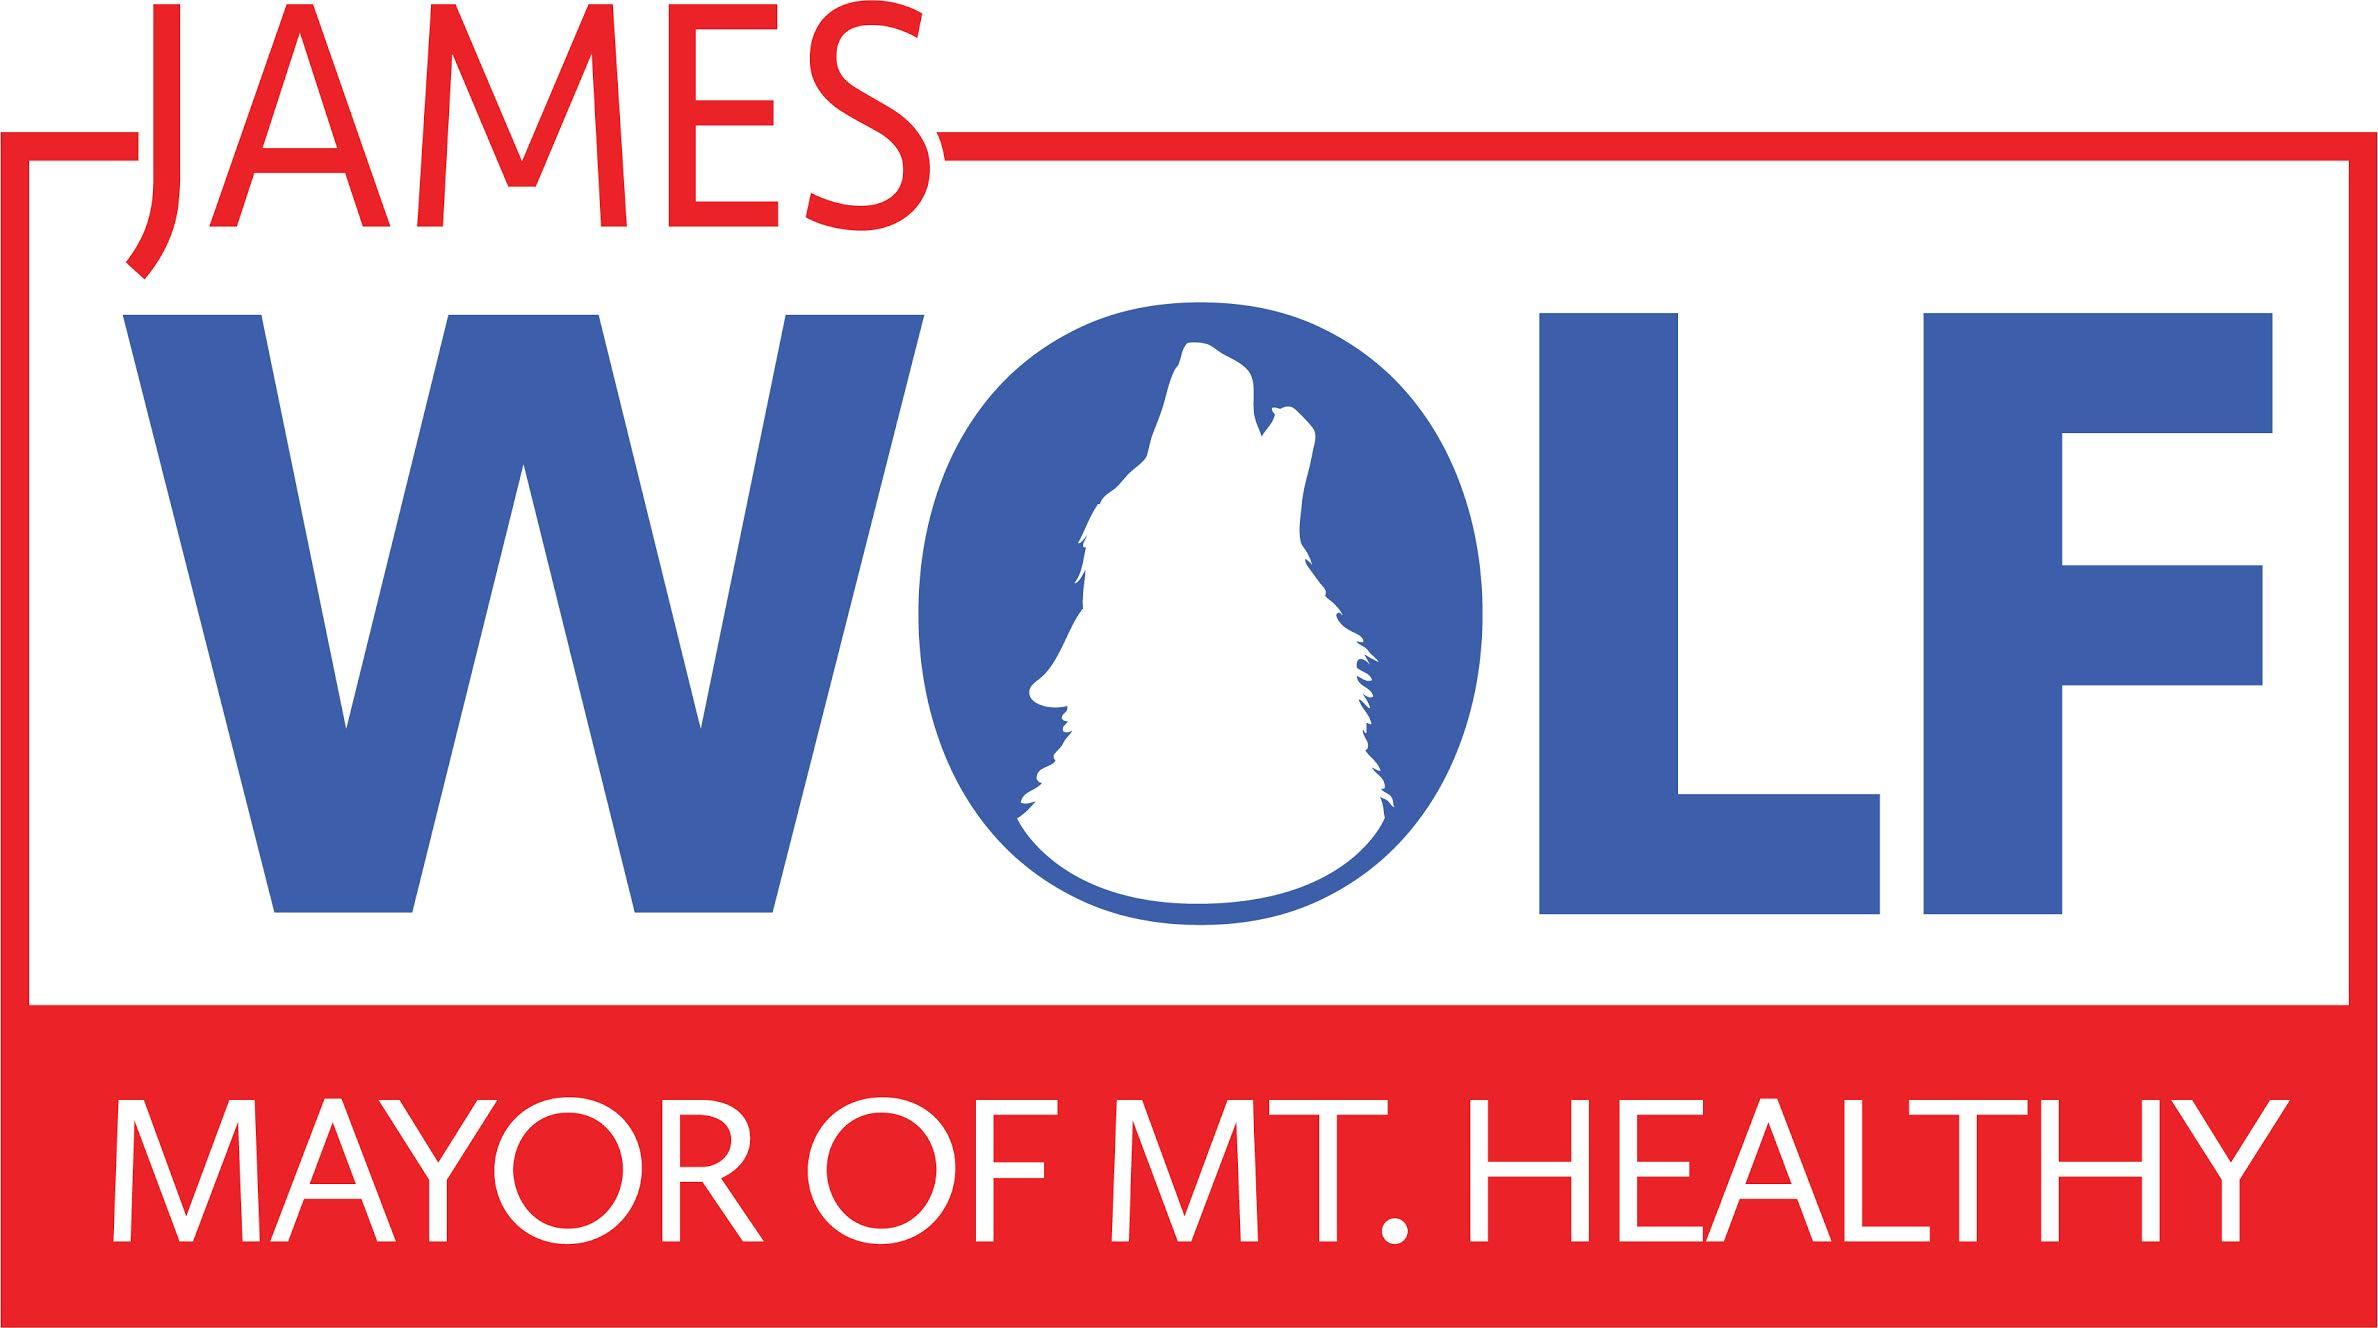 James Wolf